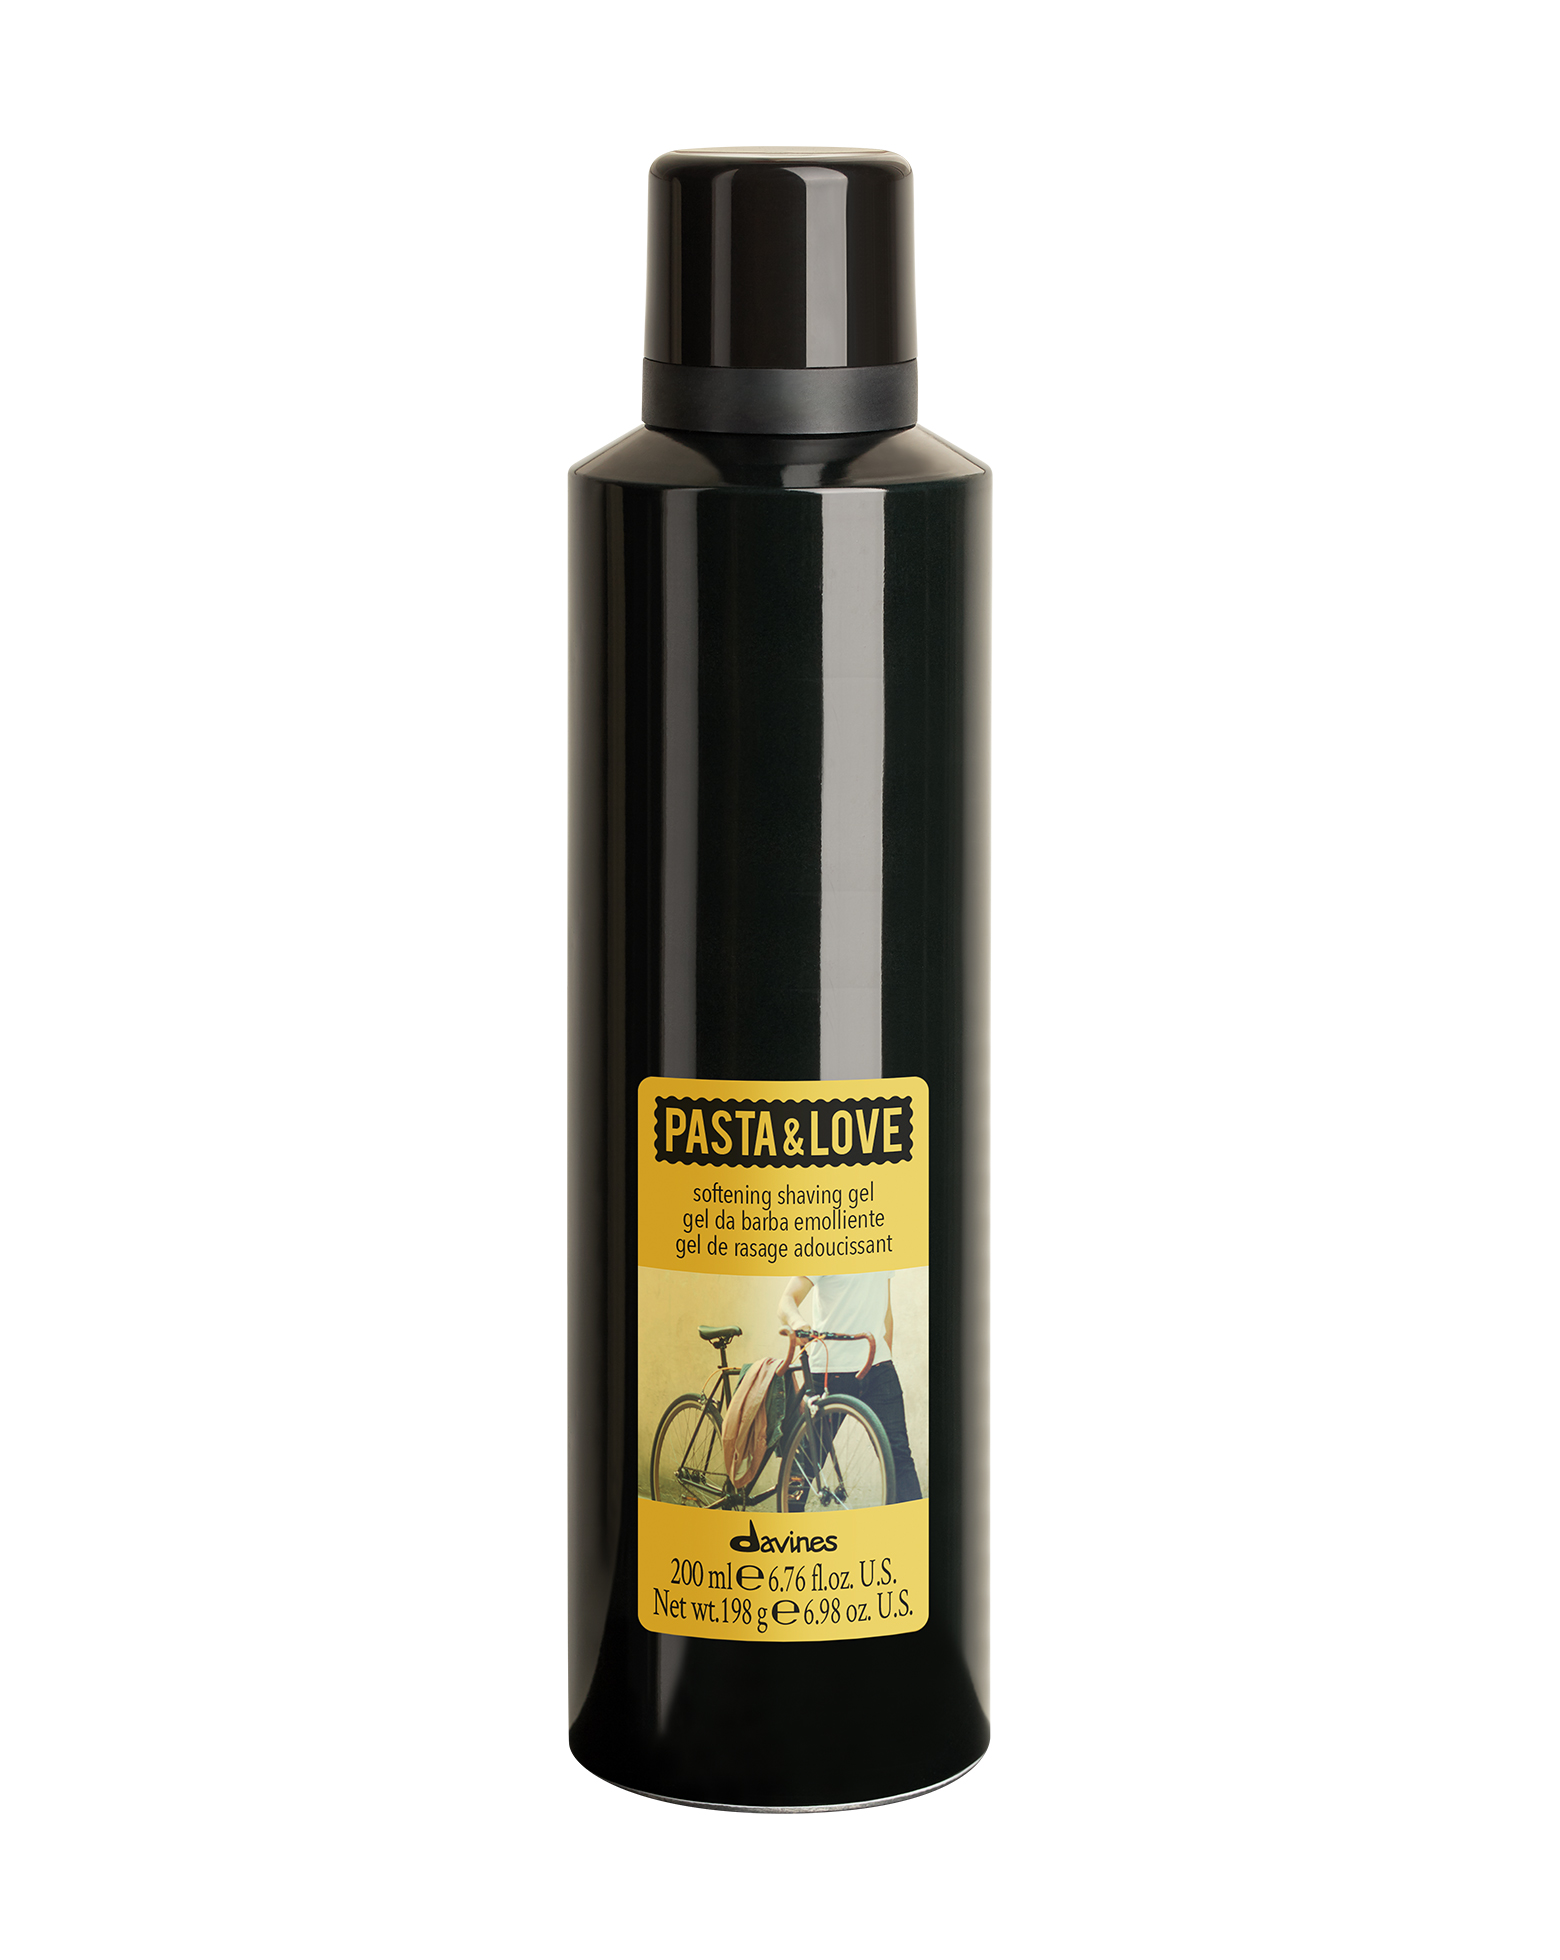 davdav106_davines-pasta-love-softening-shaving-gel_1560x1960-kg4aojpg.jpg